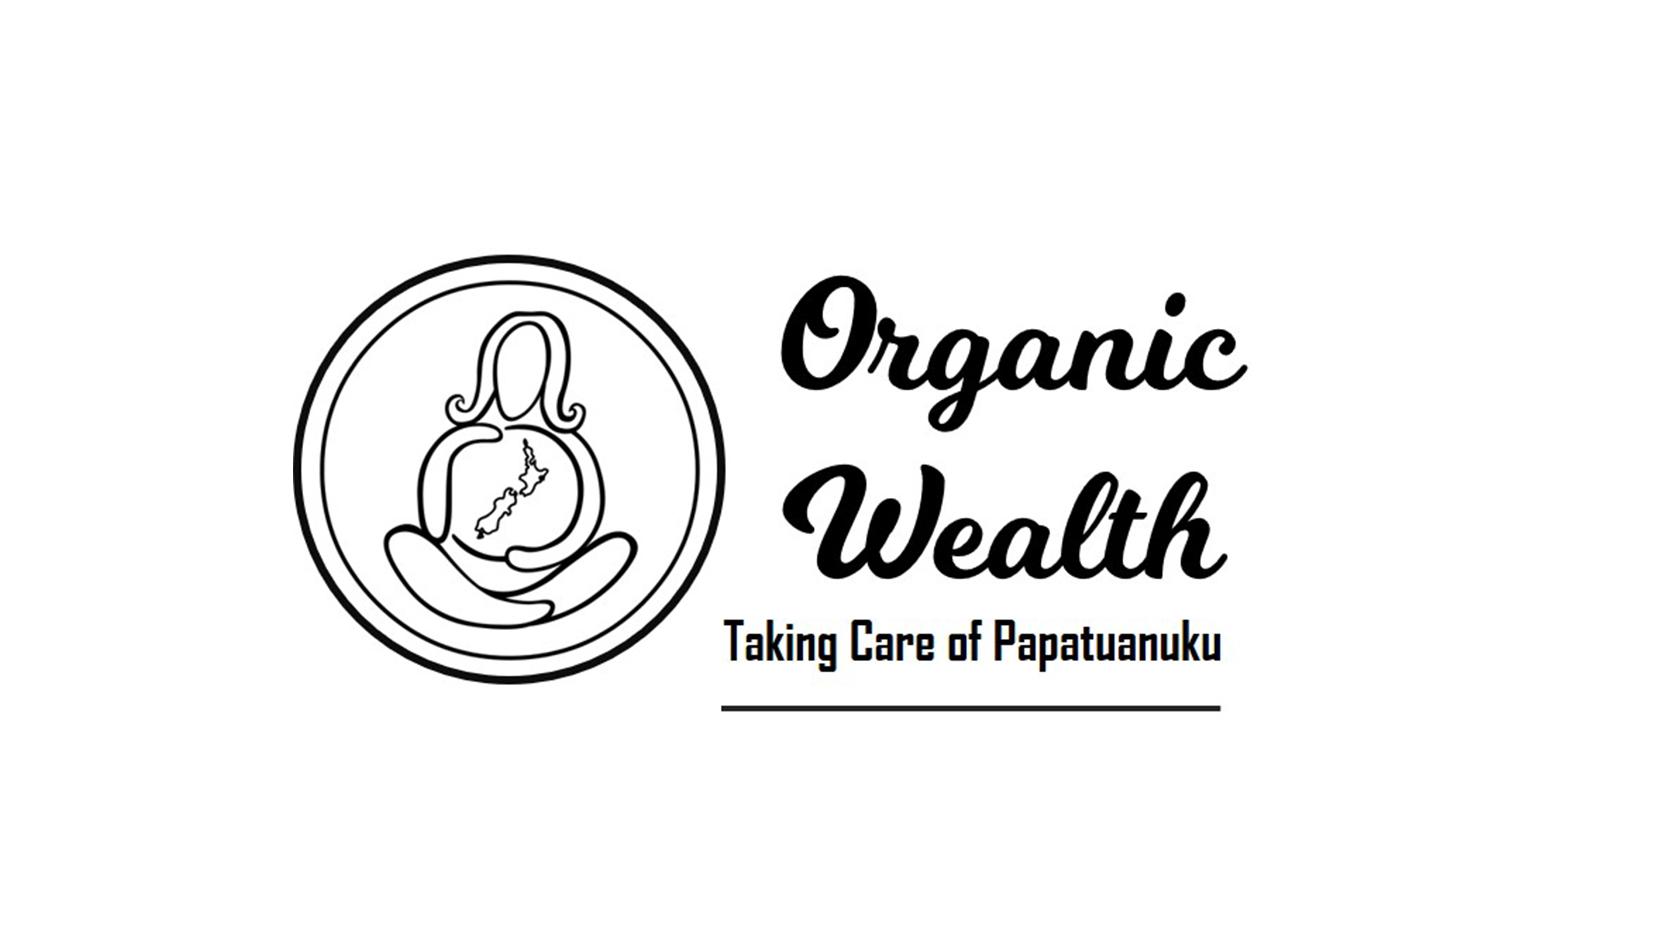 organicwealth